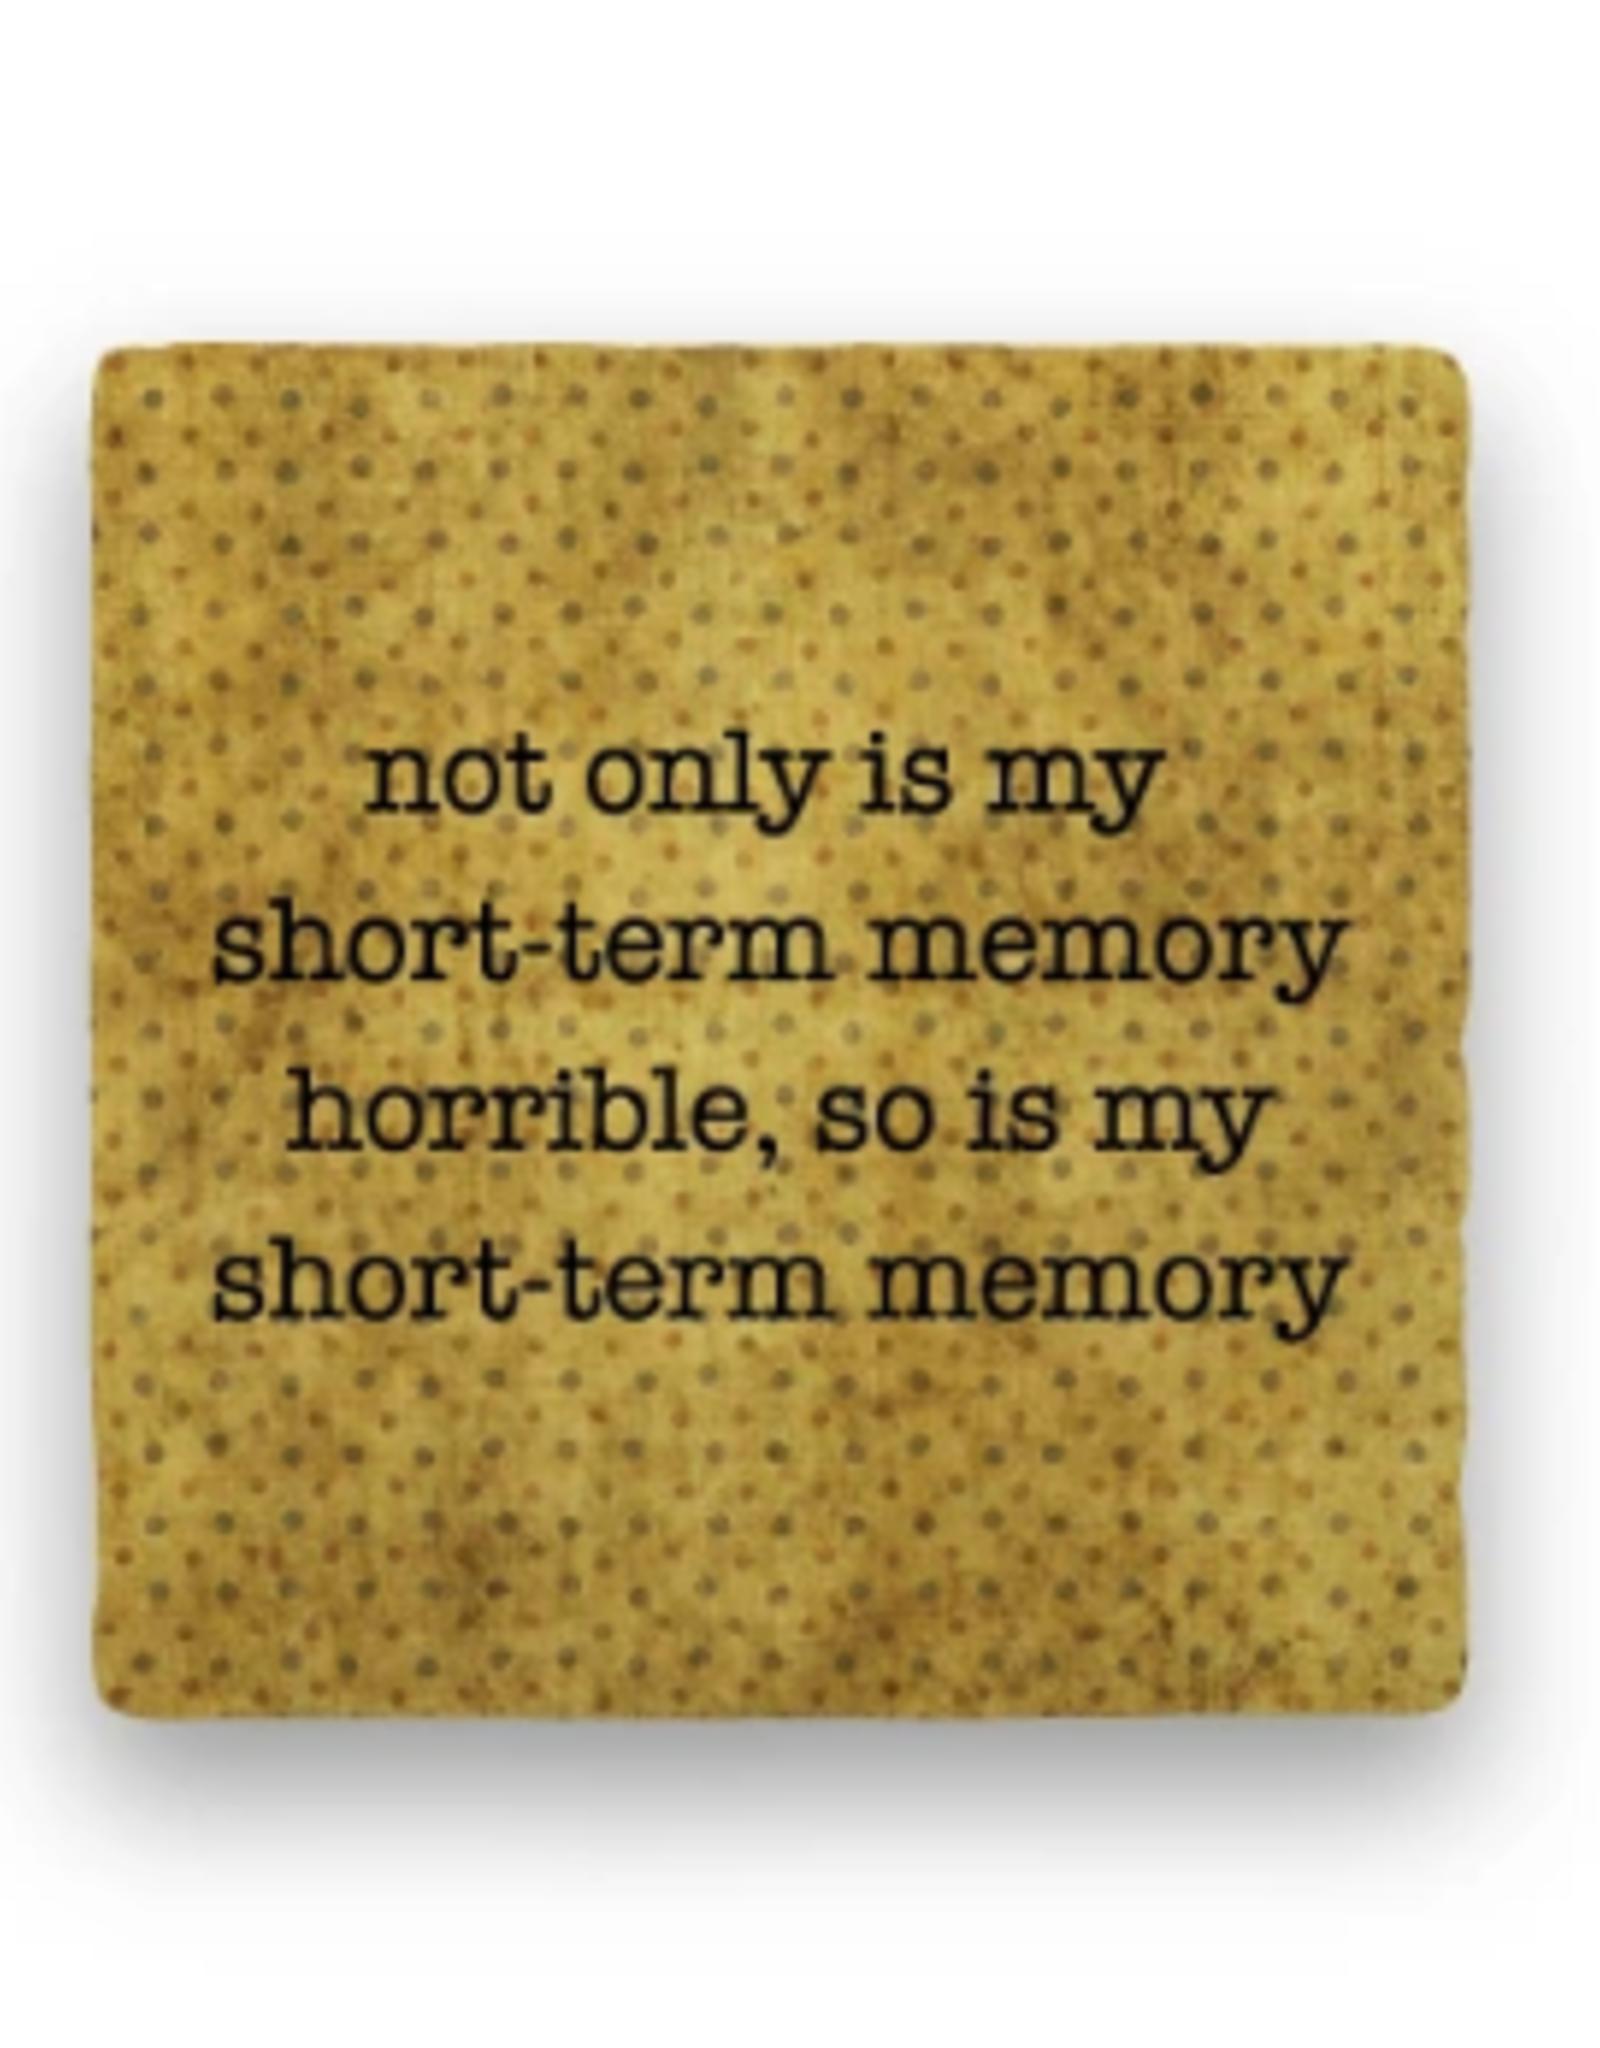 Paisley & Parsley Designs Coaster, Short-term Memory